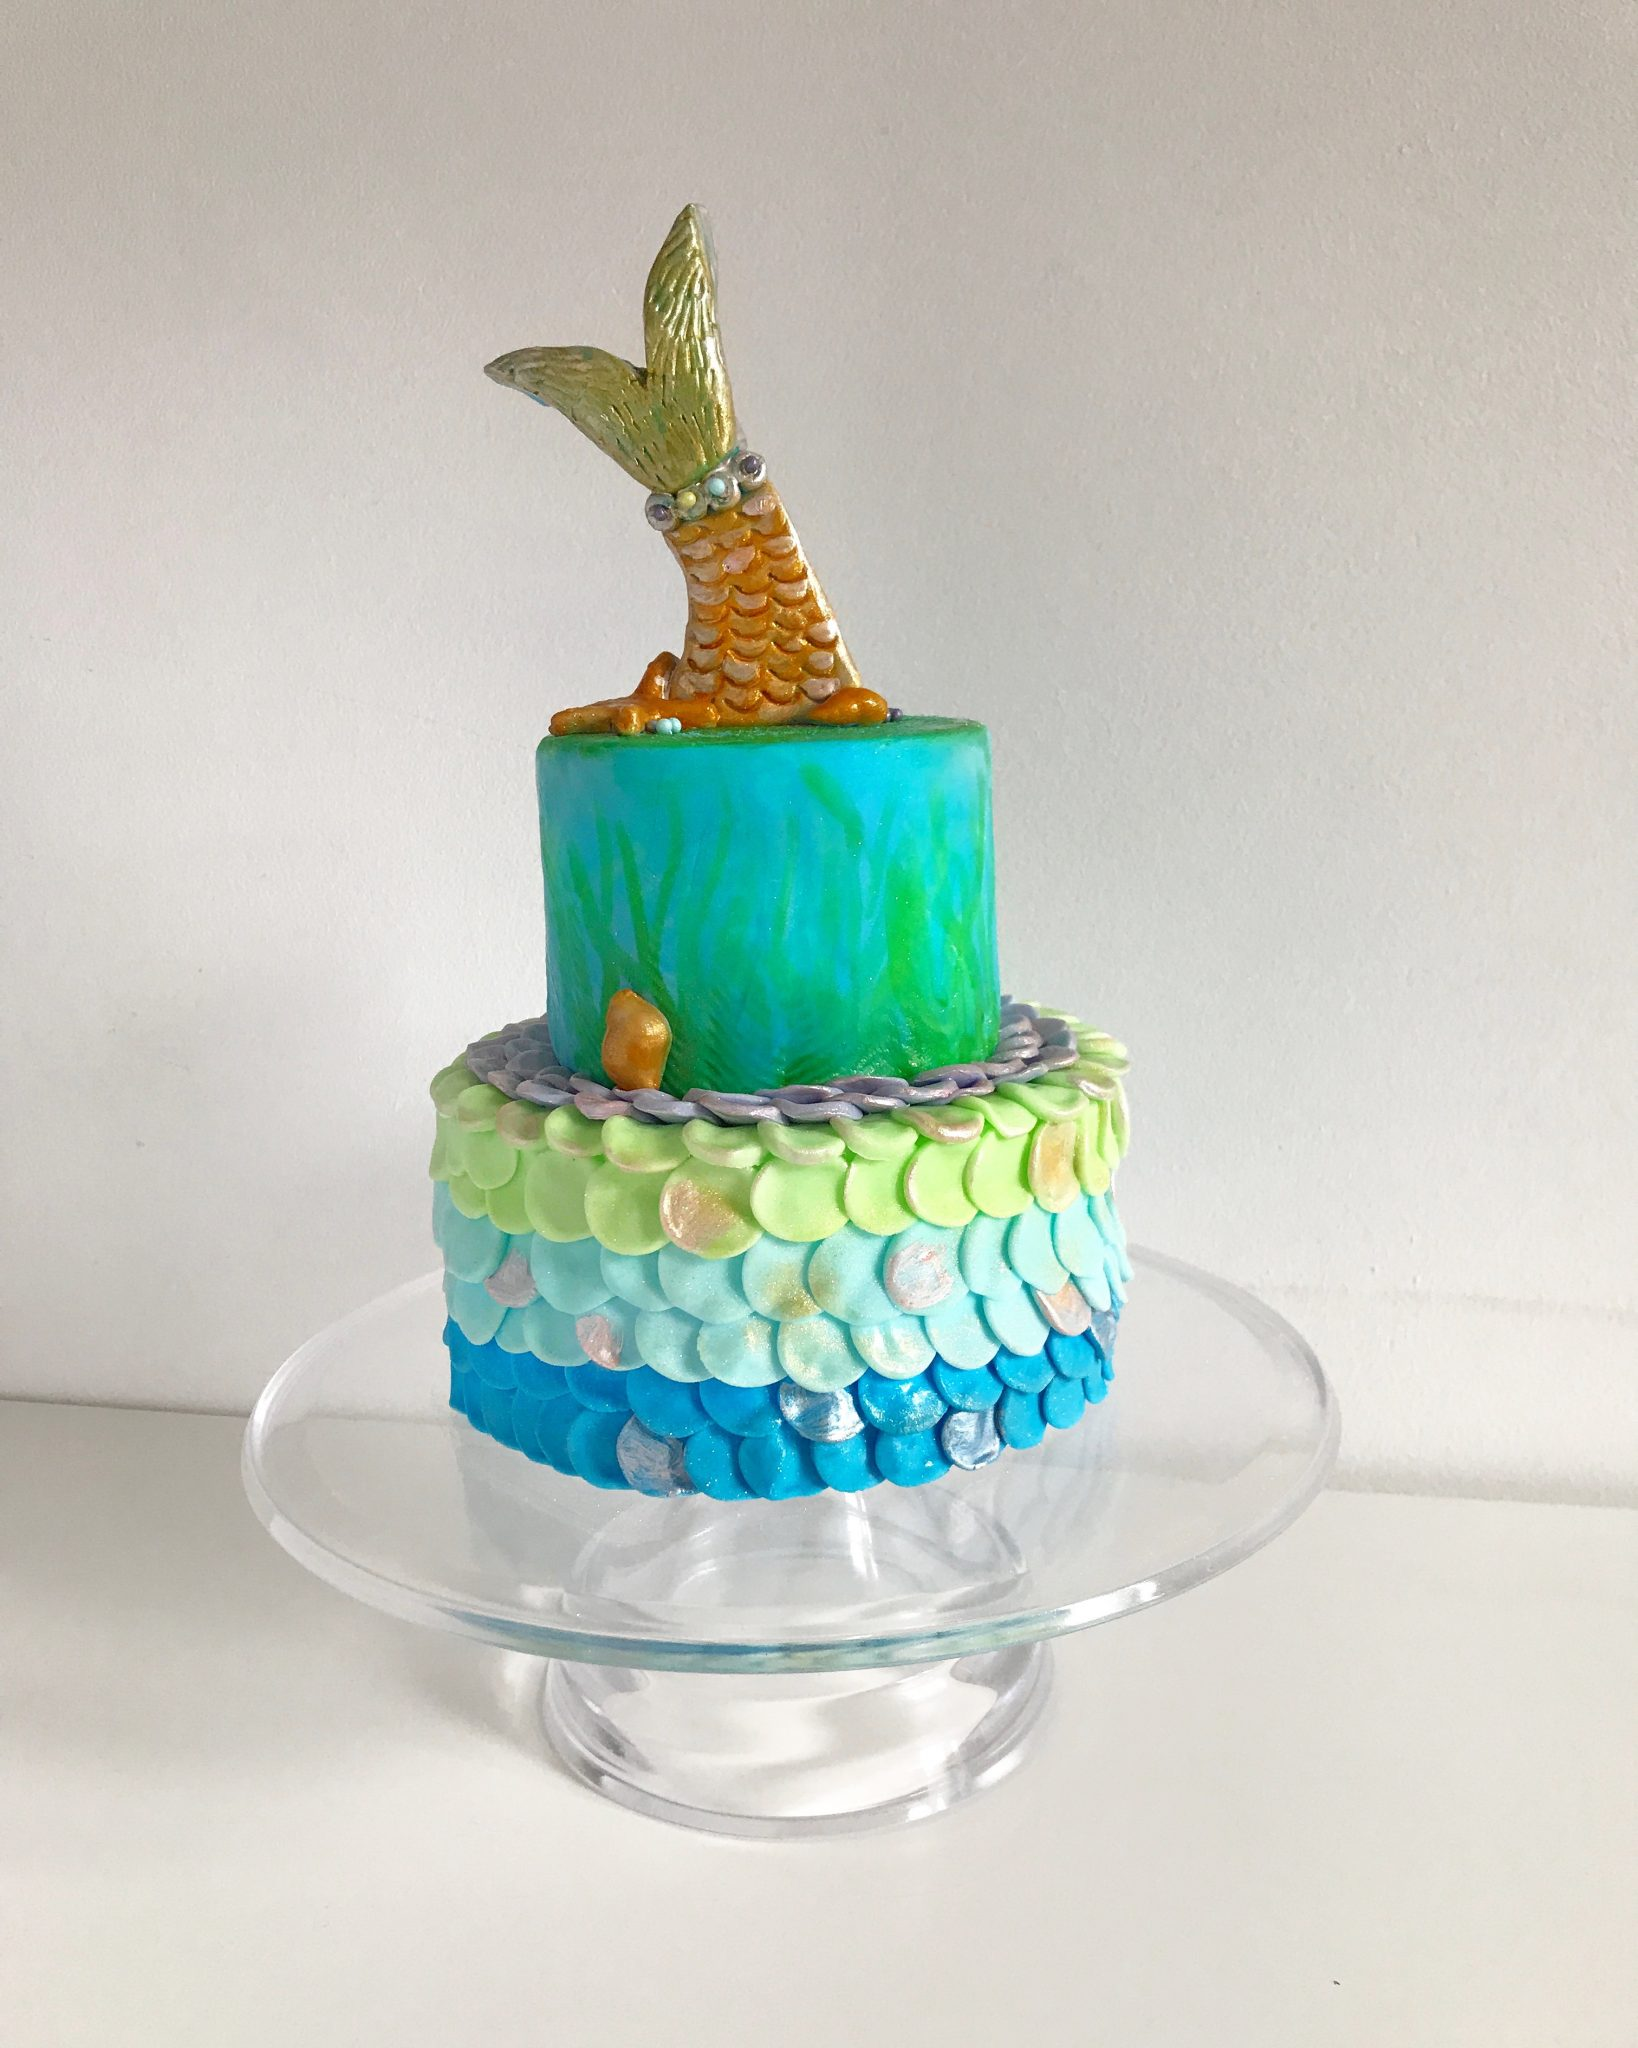 Cake Decorating in Bath